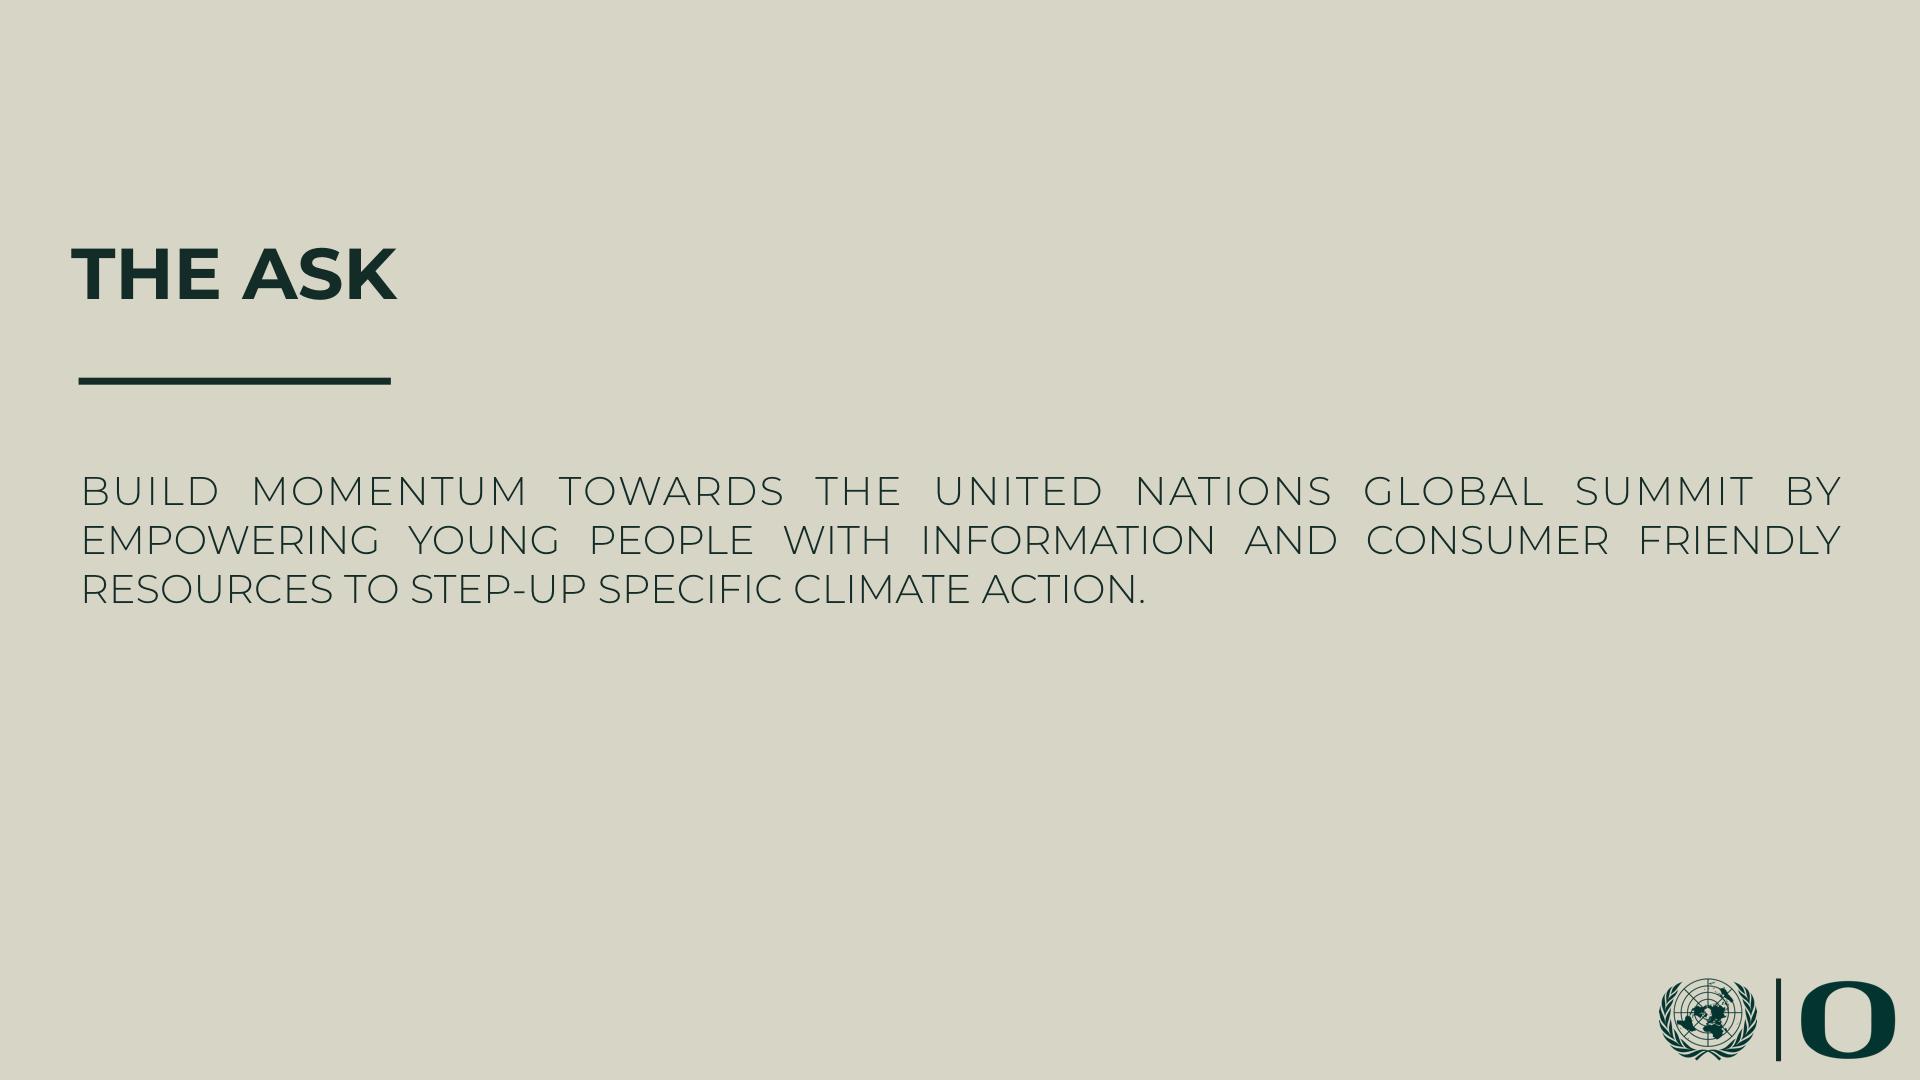 UnitedNations_InformationalDeck_Final.006.jpeg